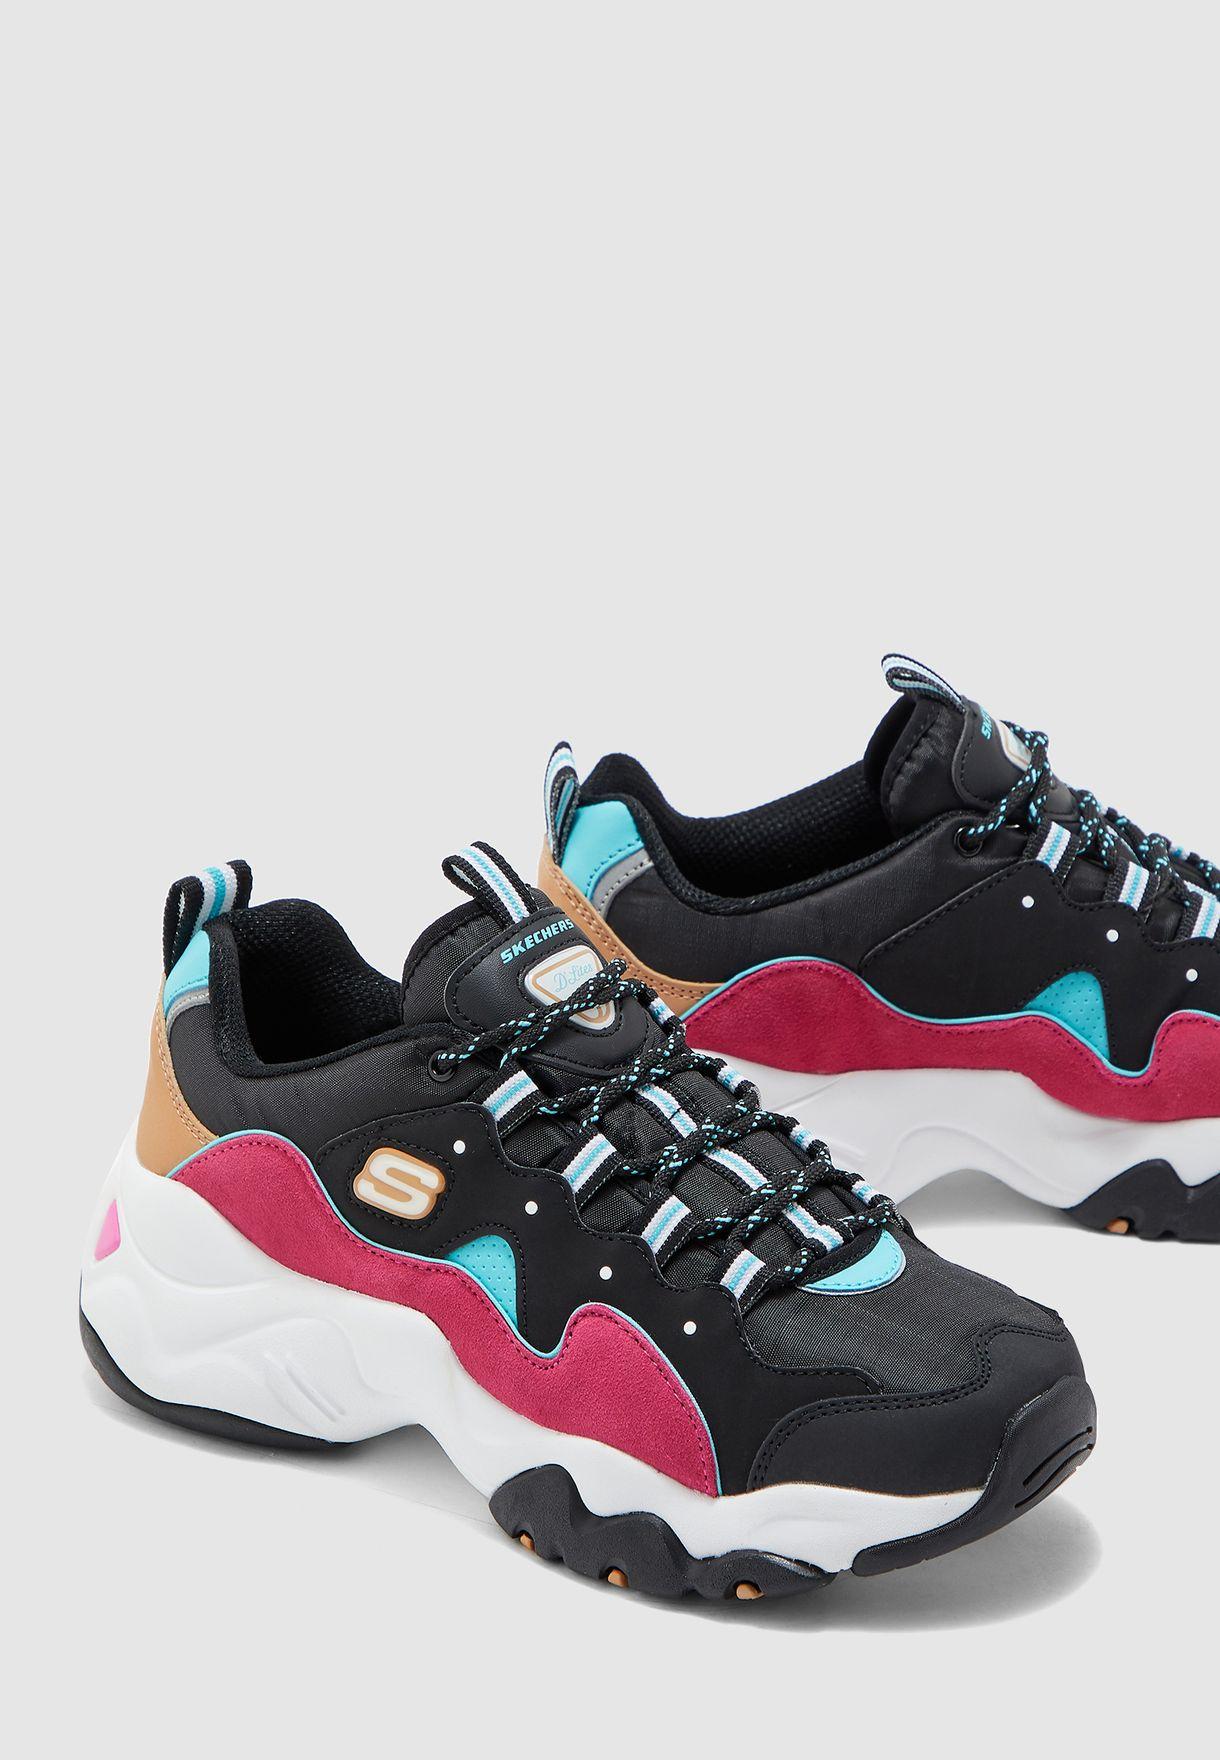 dominar Elegancia demasiado  Buy Skechers multicolor D'Lites 3.0 for Women in MENA, Worldwide |  13378-BBLP